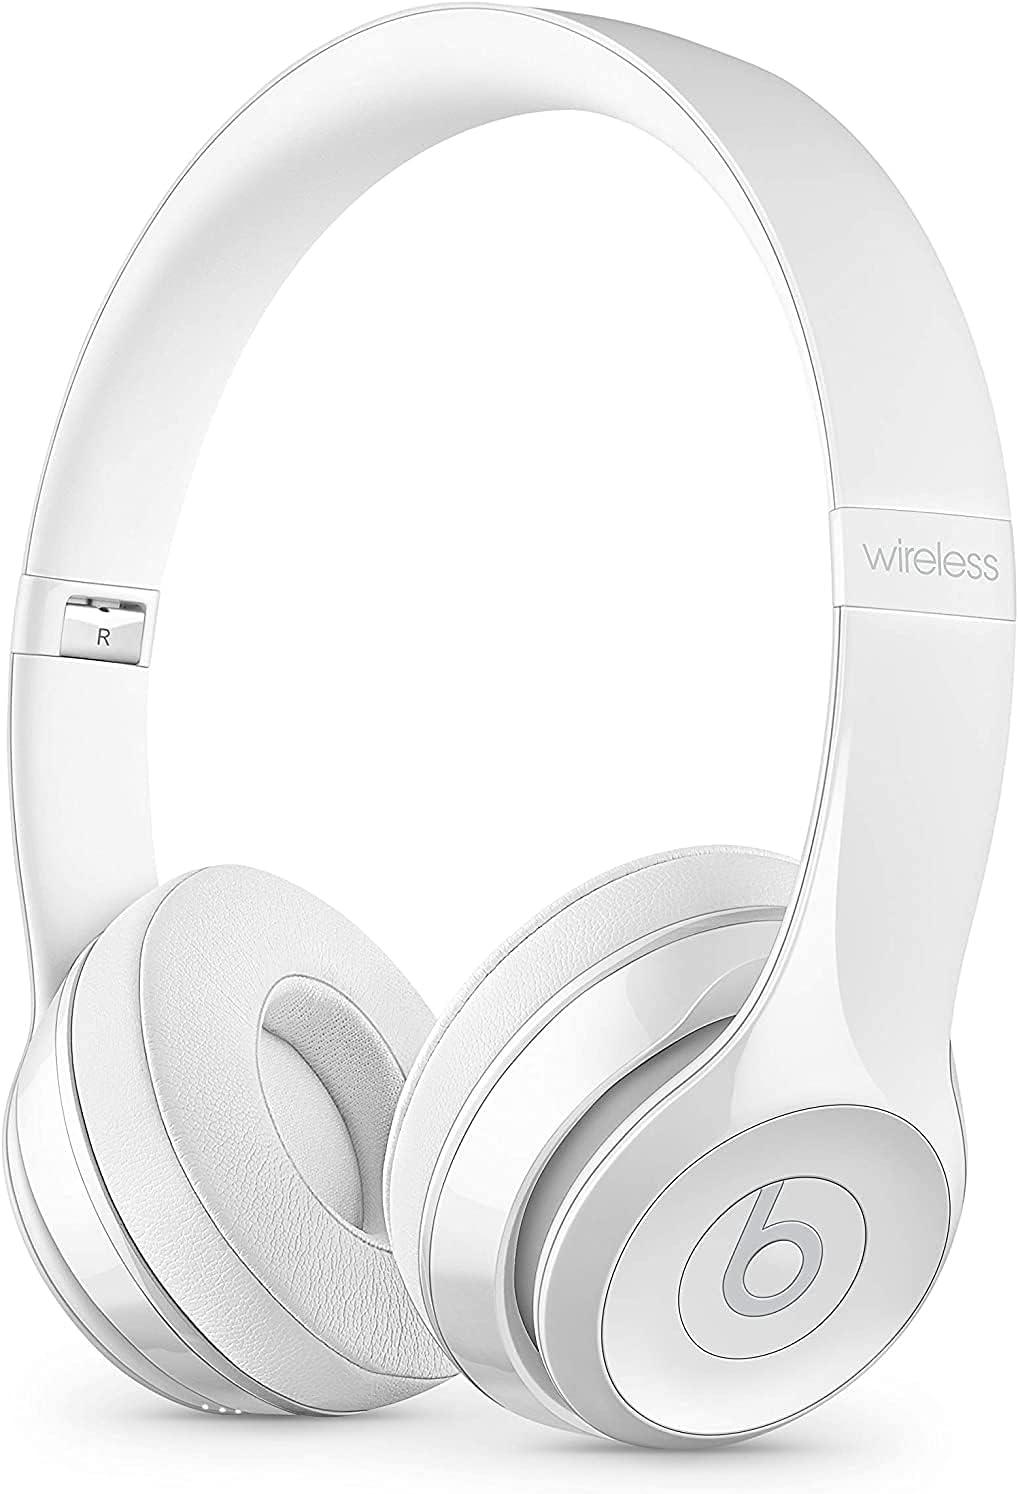 Beats Solo3 Wireless On-Ear Headphones - Gloss White (Renewed)